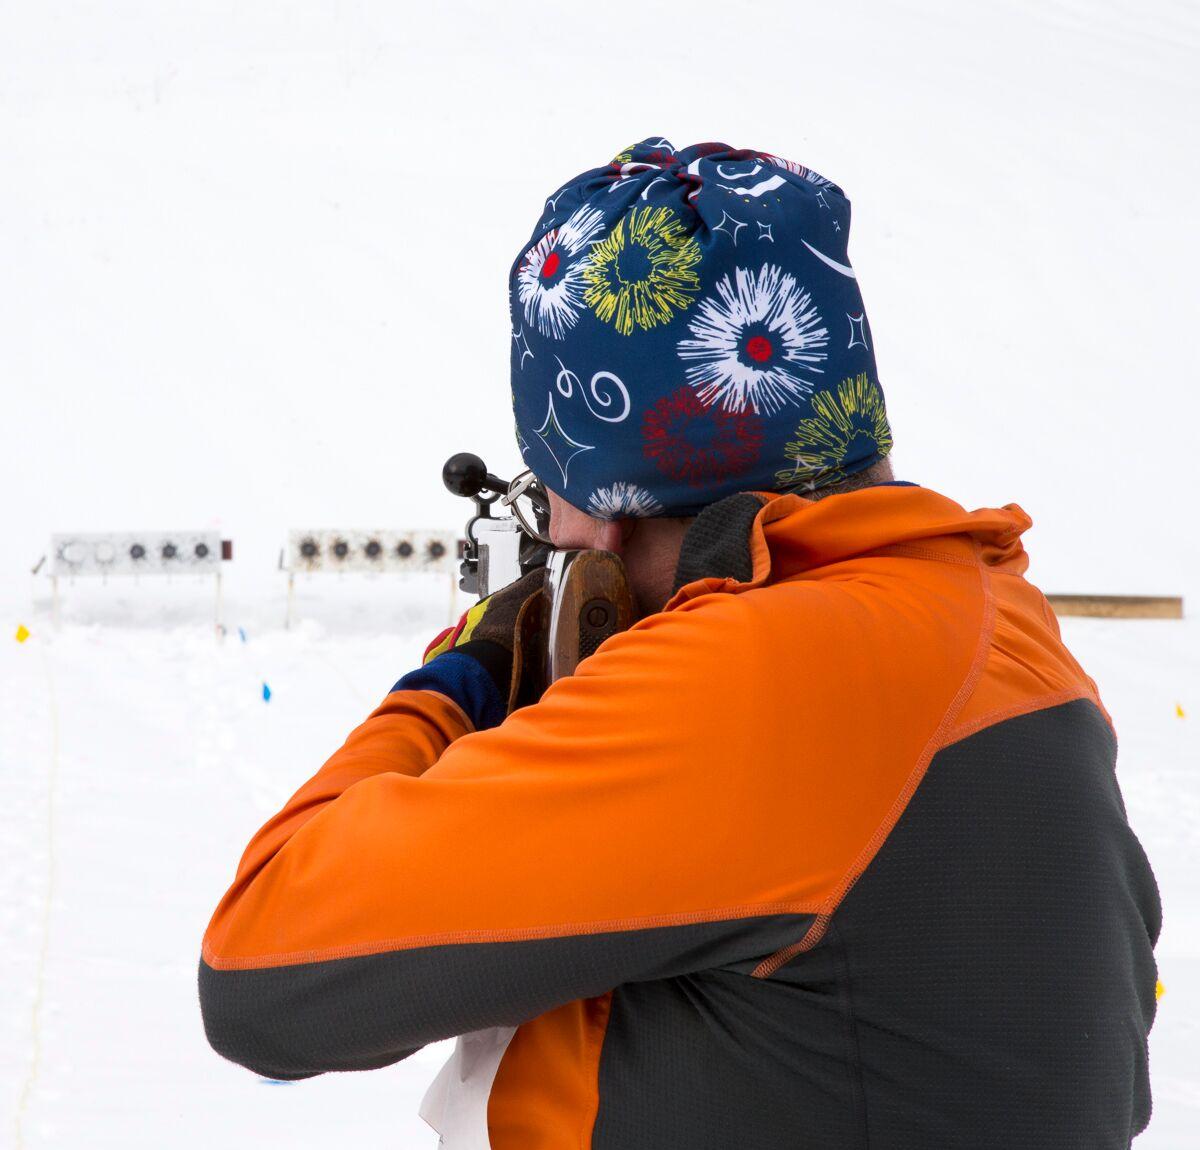 Biathlon Clinics